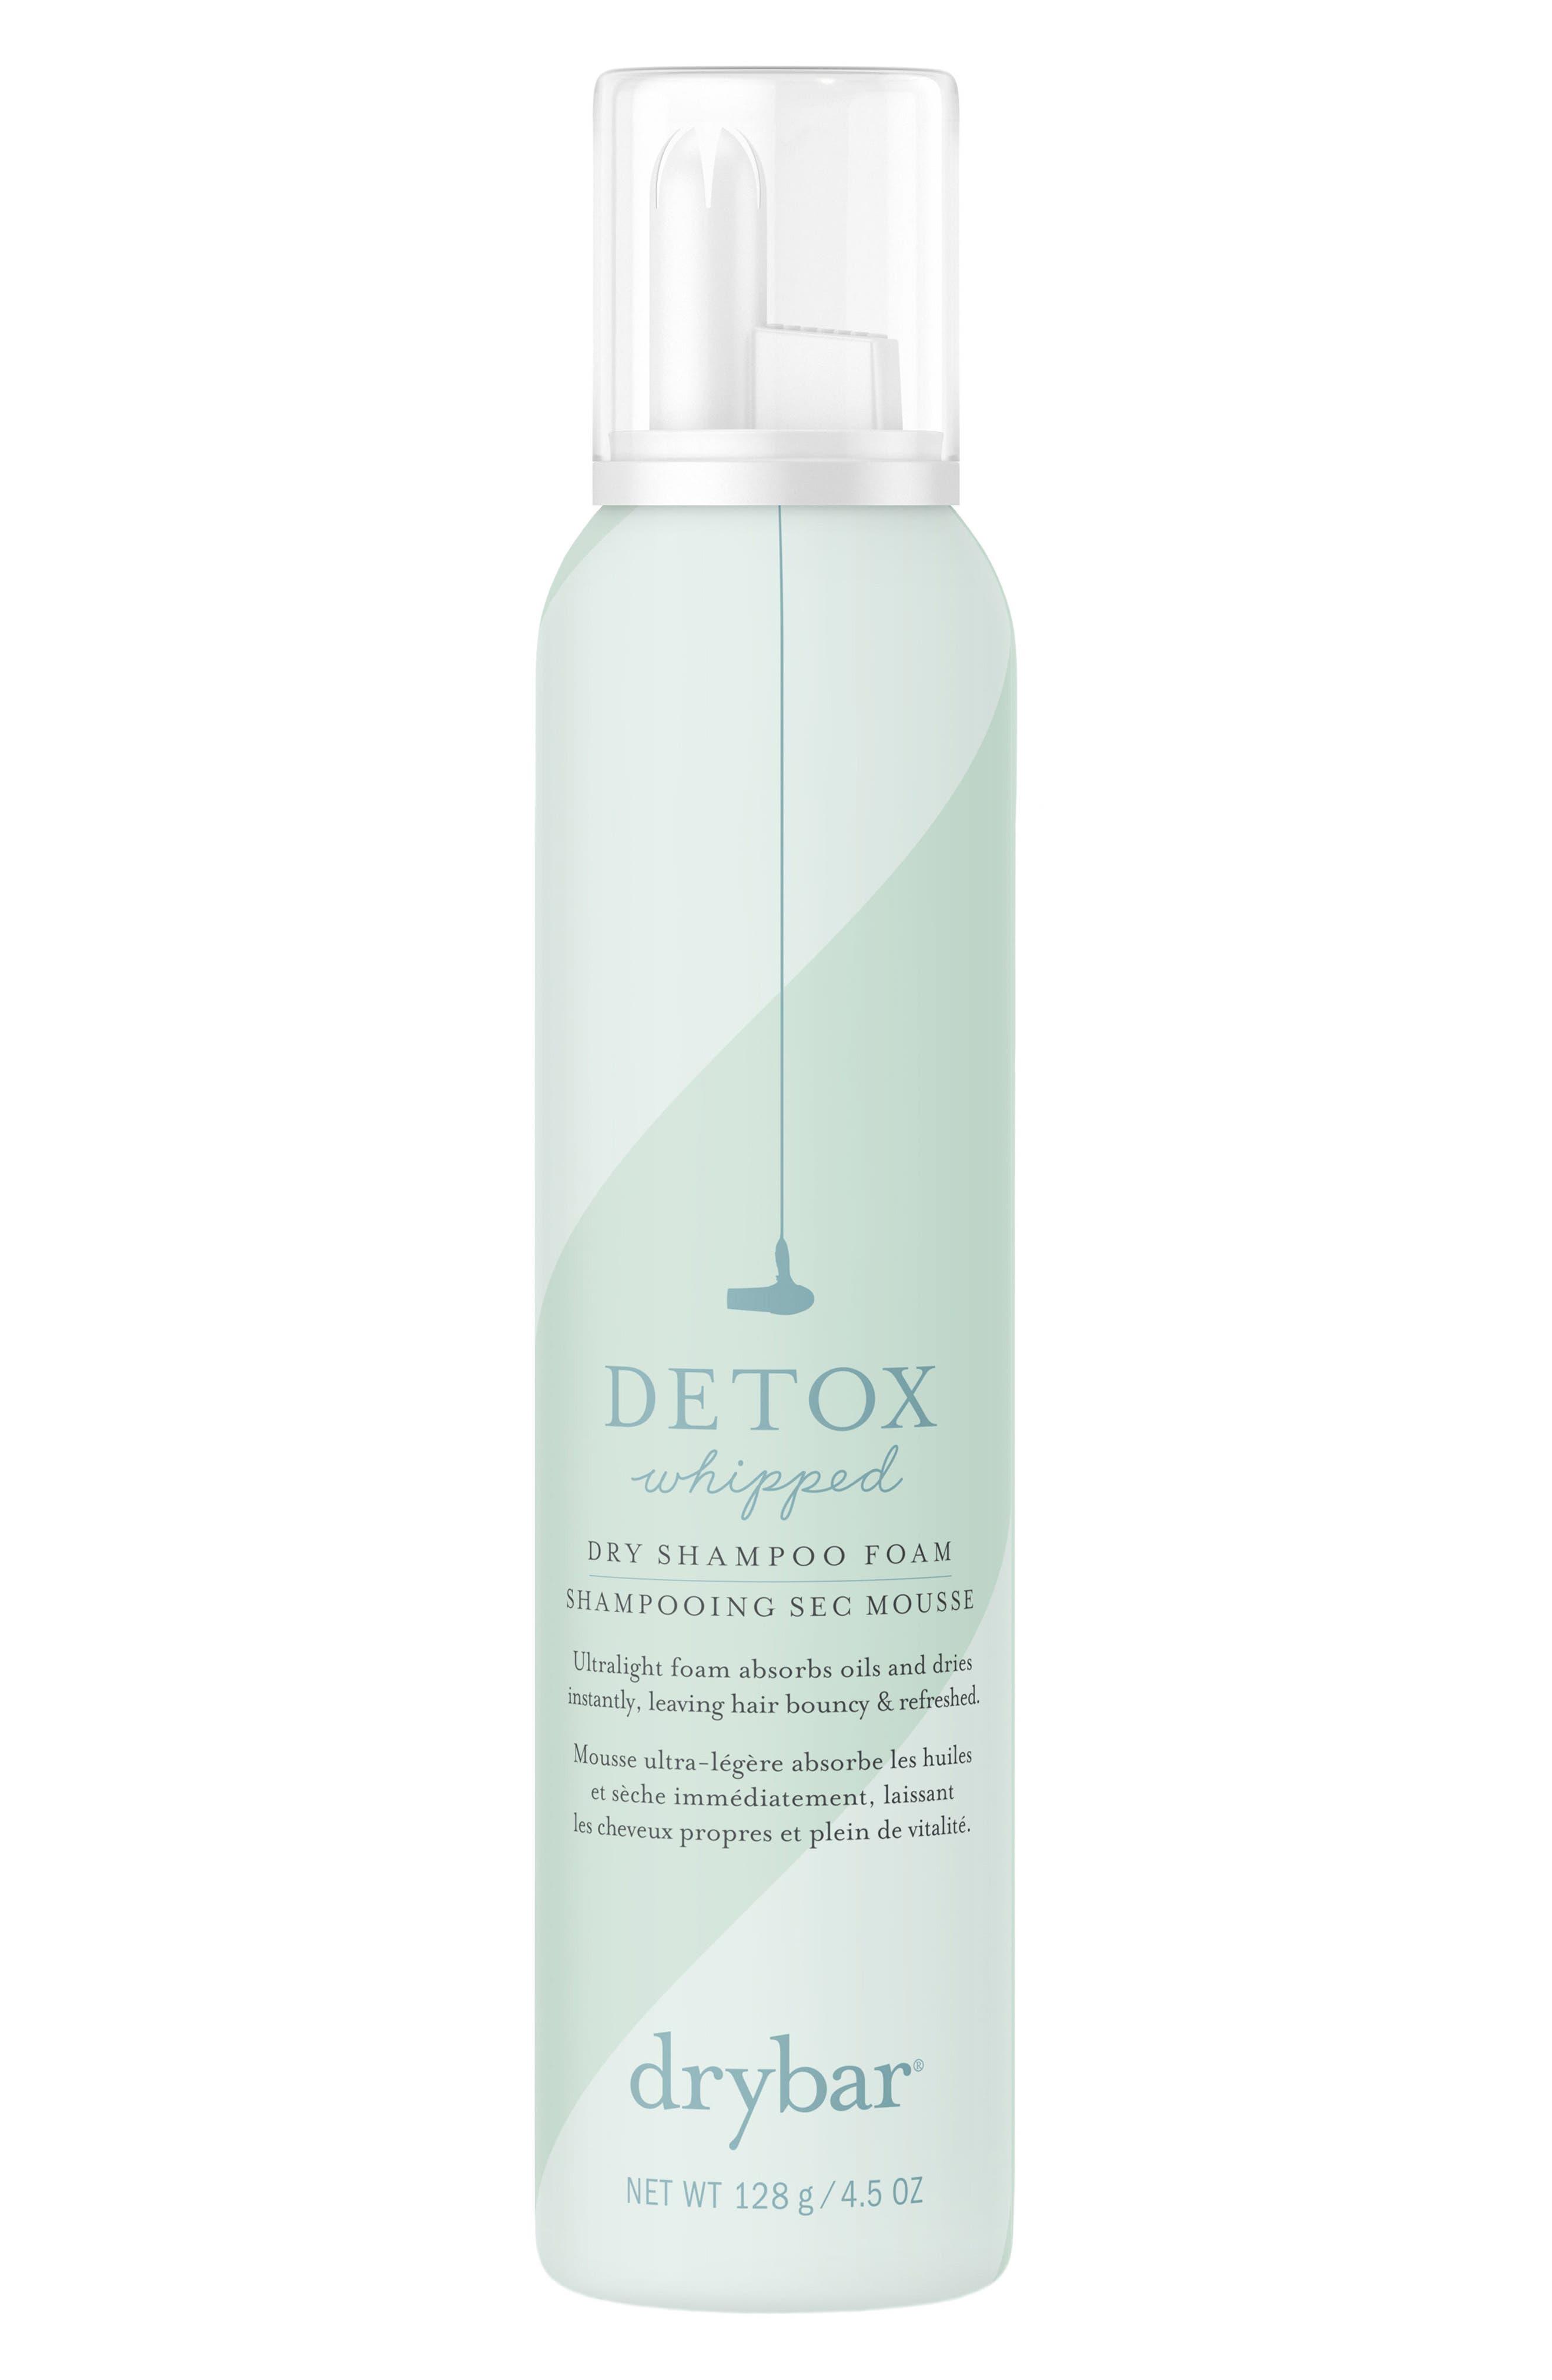 Drybar Detox Whipped Dry Shampoo Foam